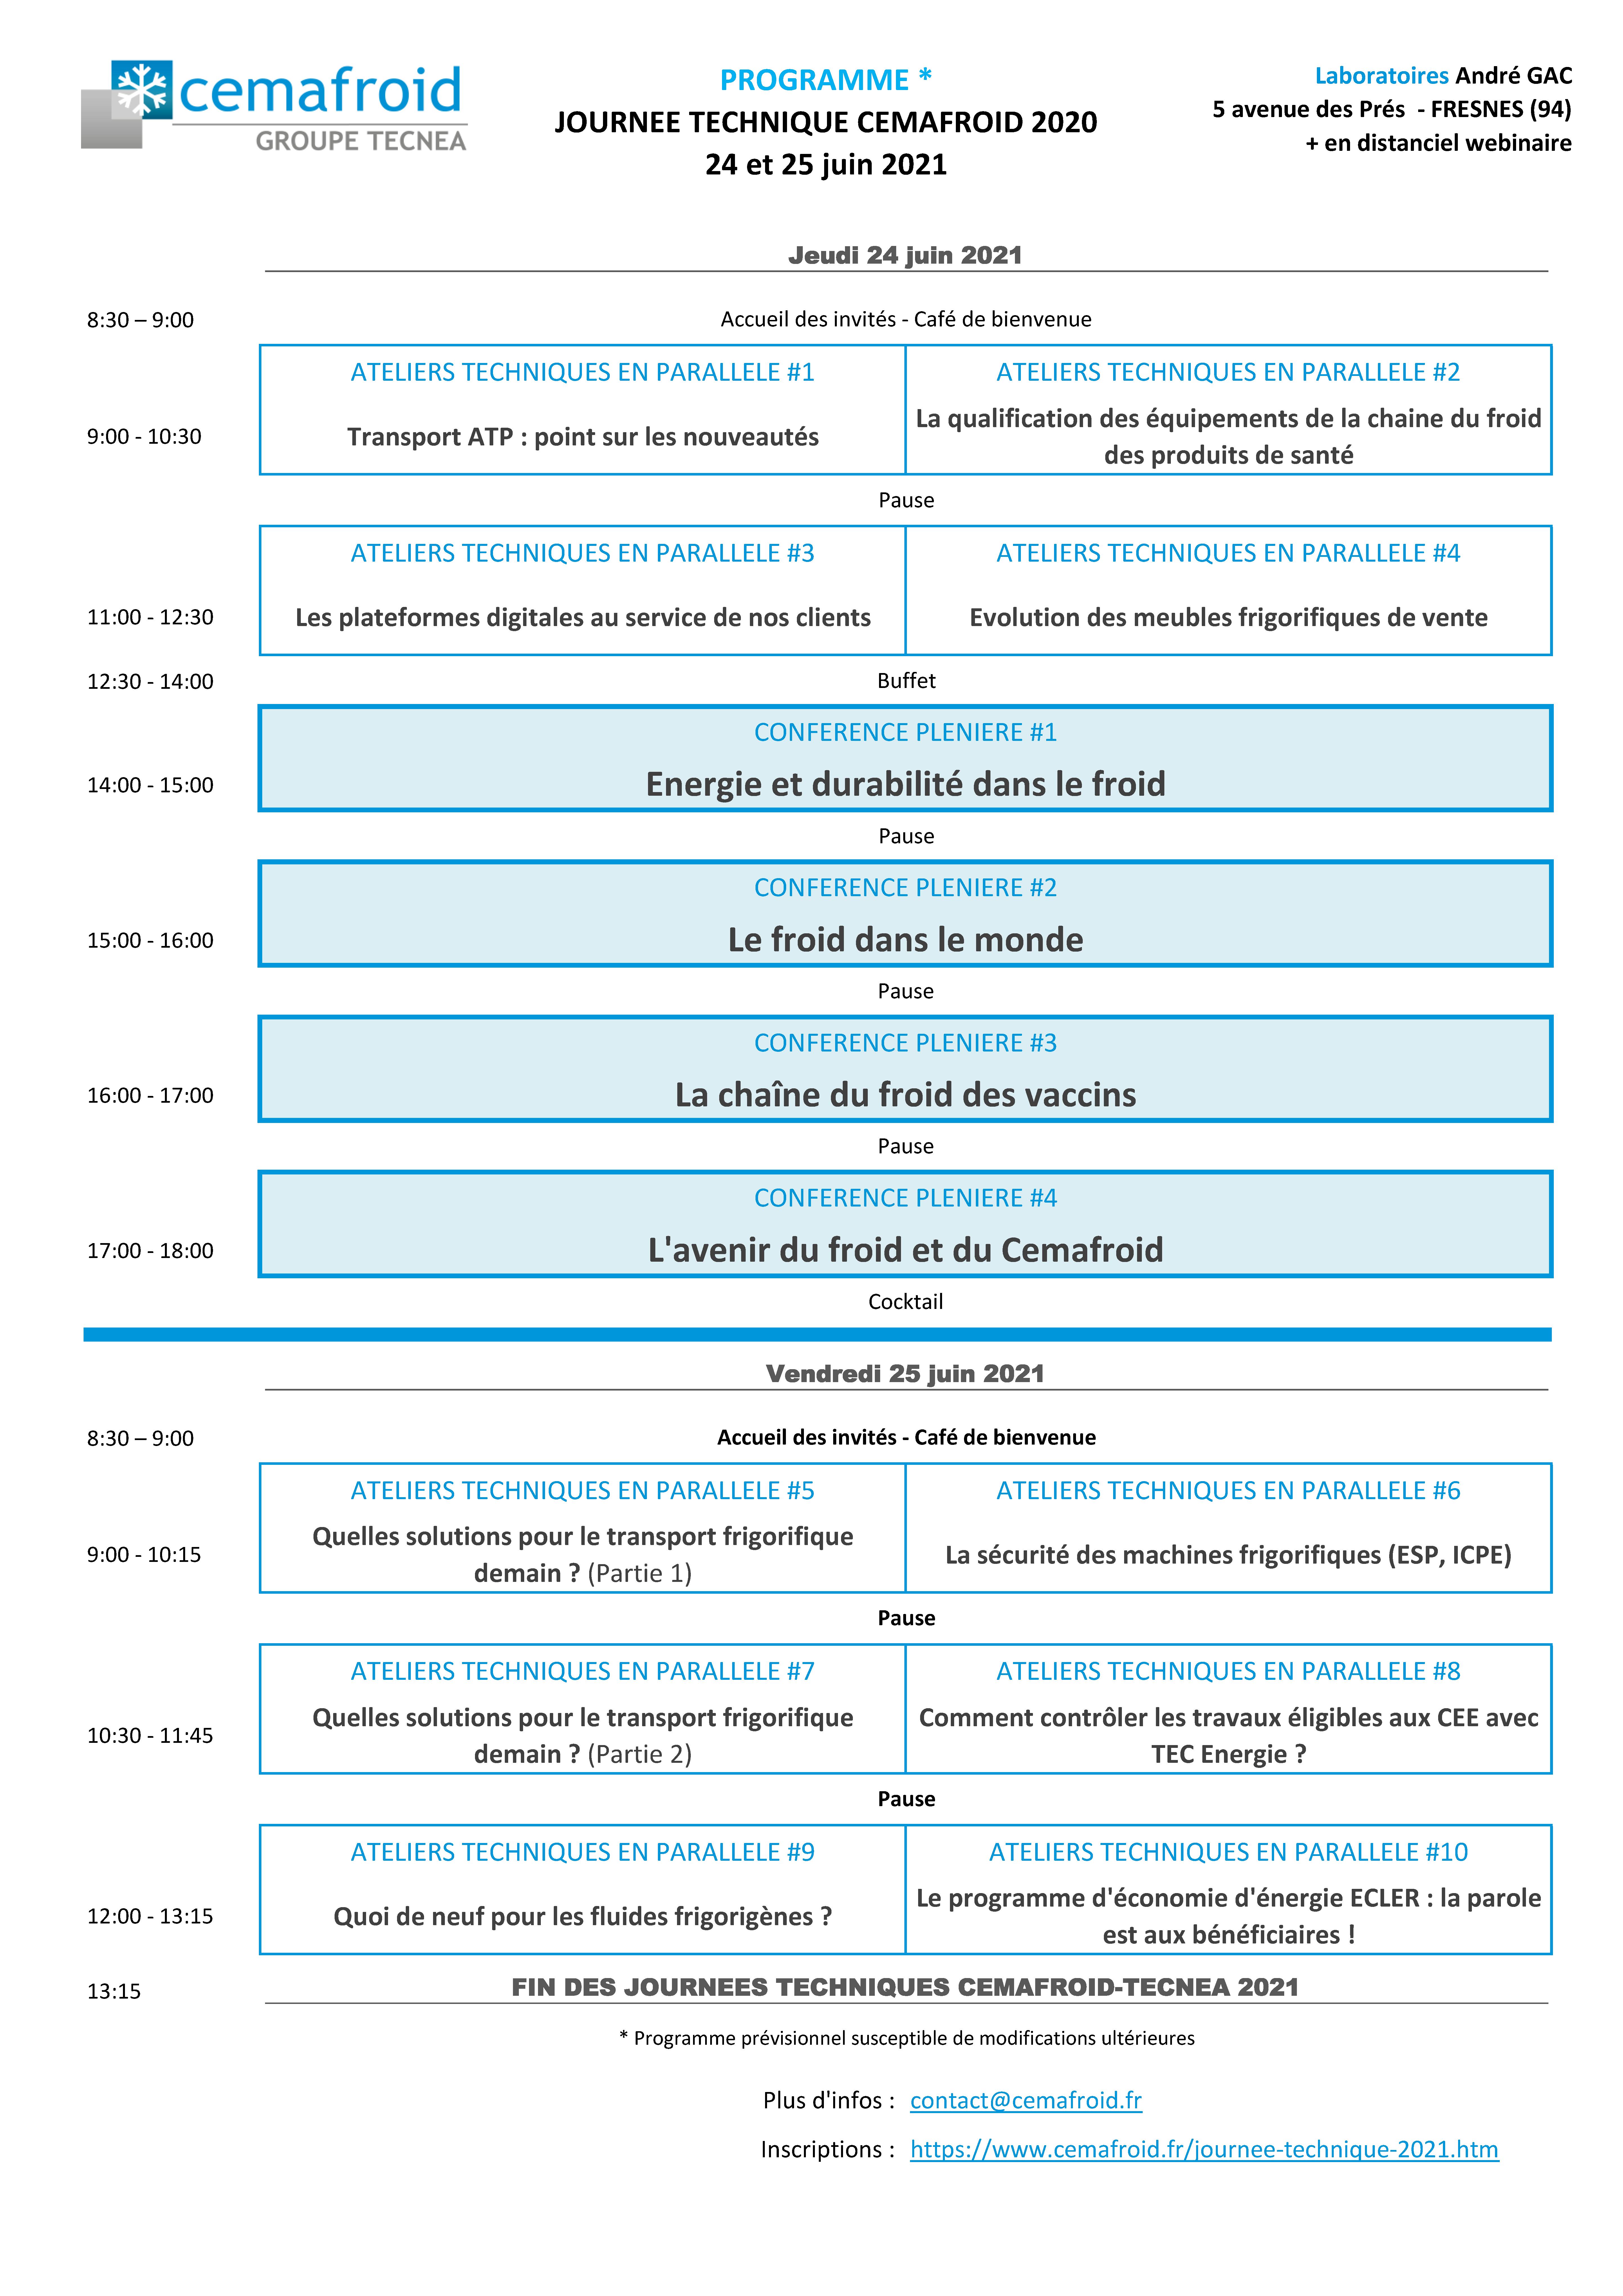 Programme JT 2021 Tecnea Cemafroid - site web